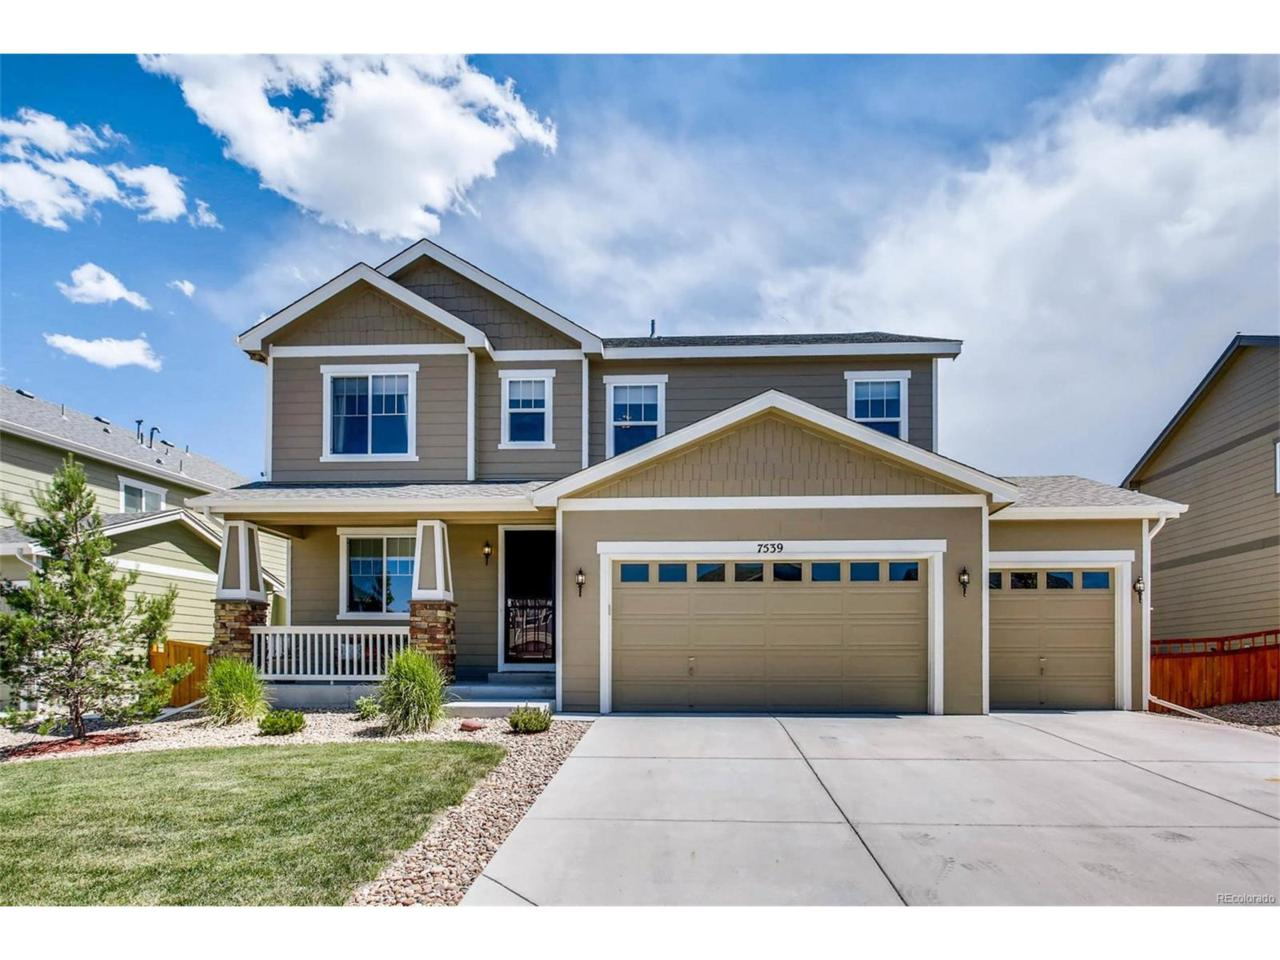 7539 Grady Circle, Castle Rock, CO 80108 (MLS #7194360) :: 8z Real Estate